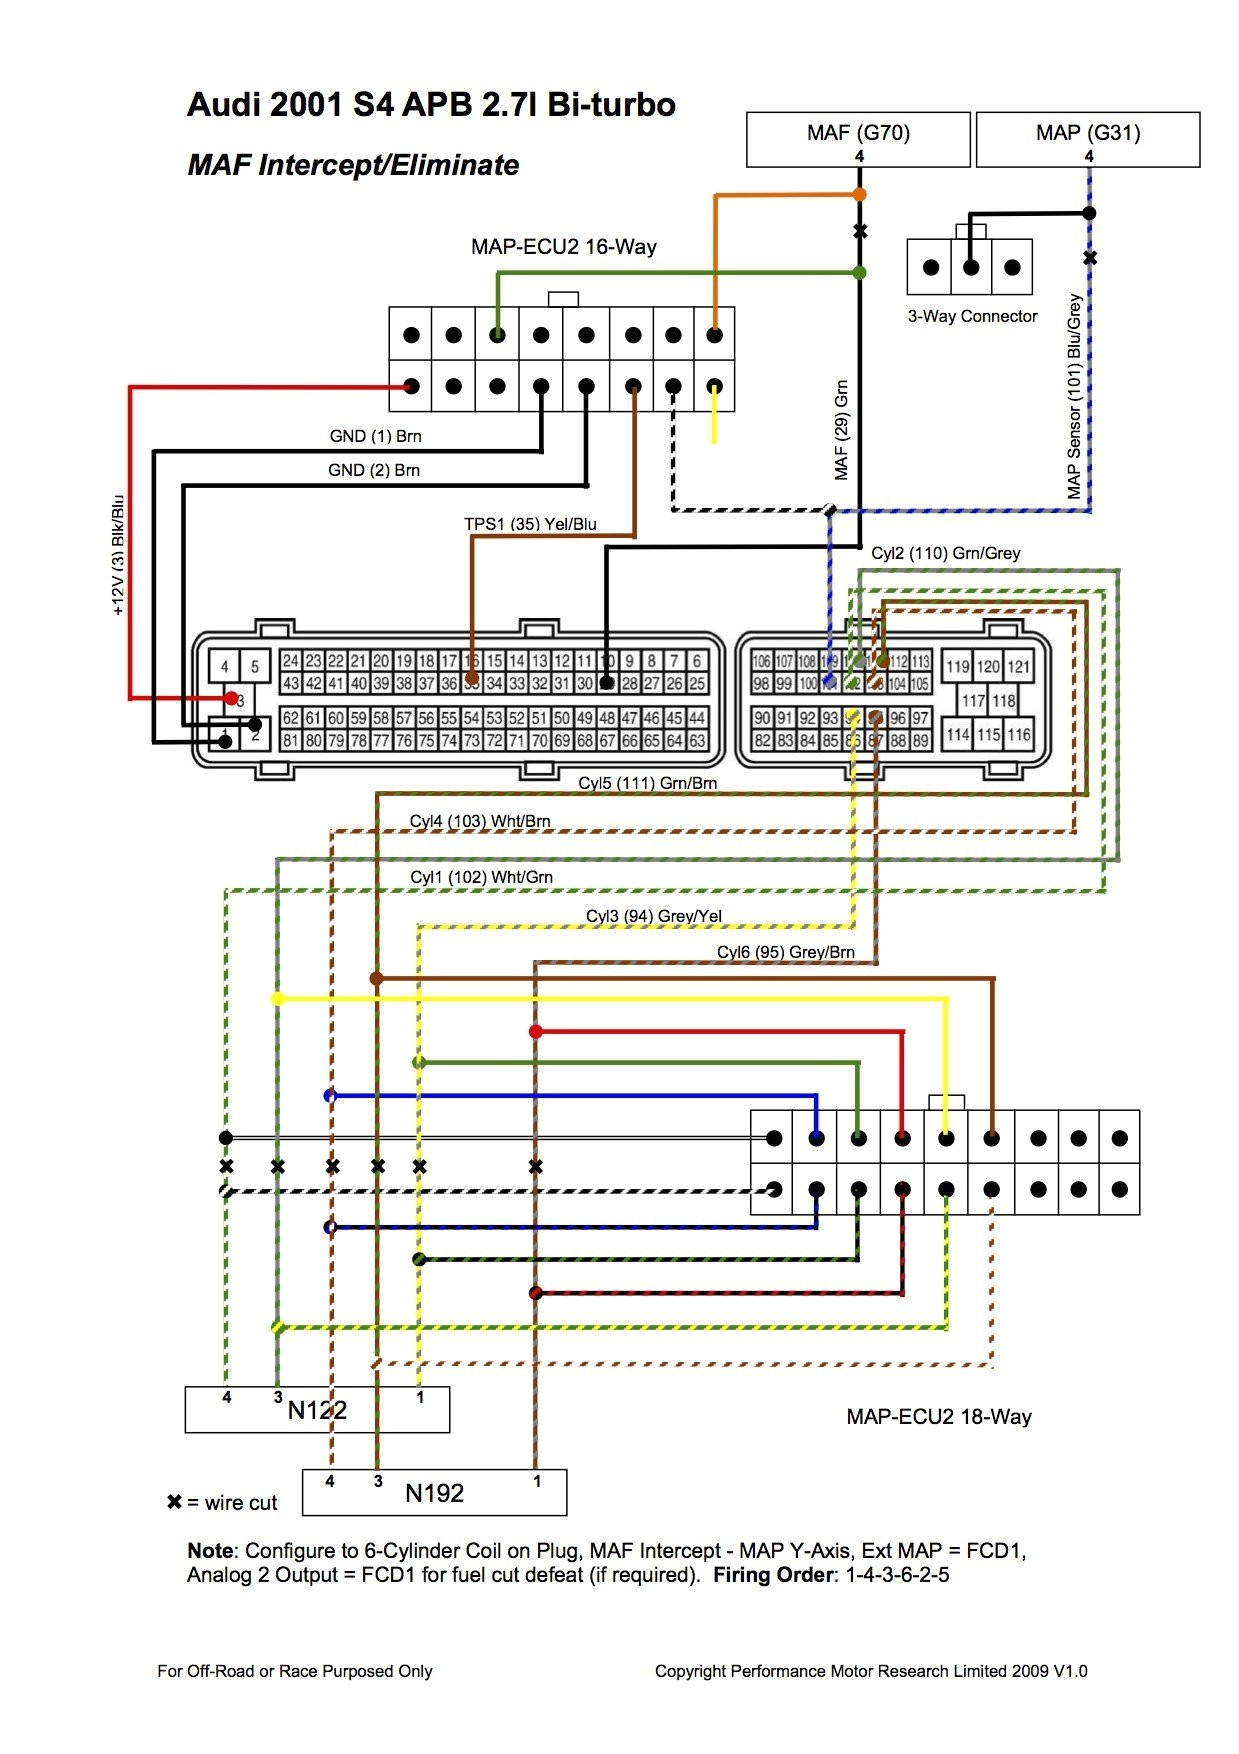 2010 dodge ram wiring diagram wiring diagrams value 2010 dodge ram headlight wiring diagram 2010 dodge ram wiring diagram